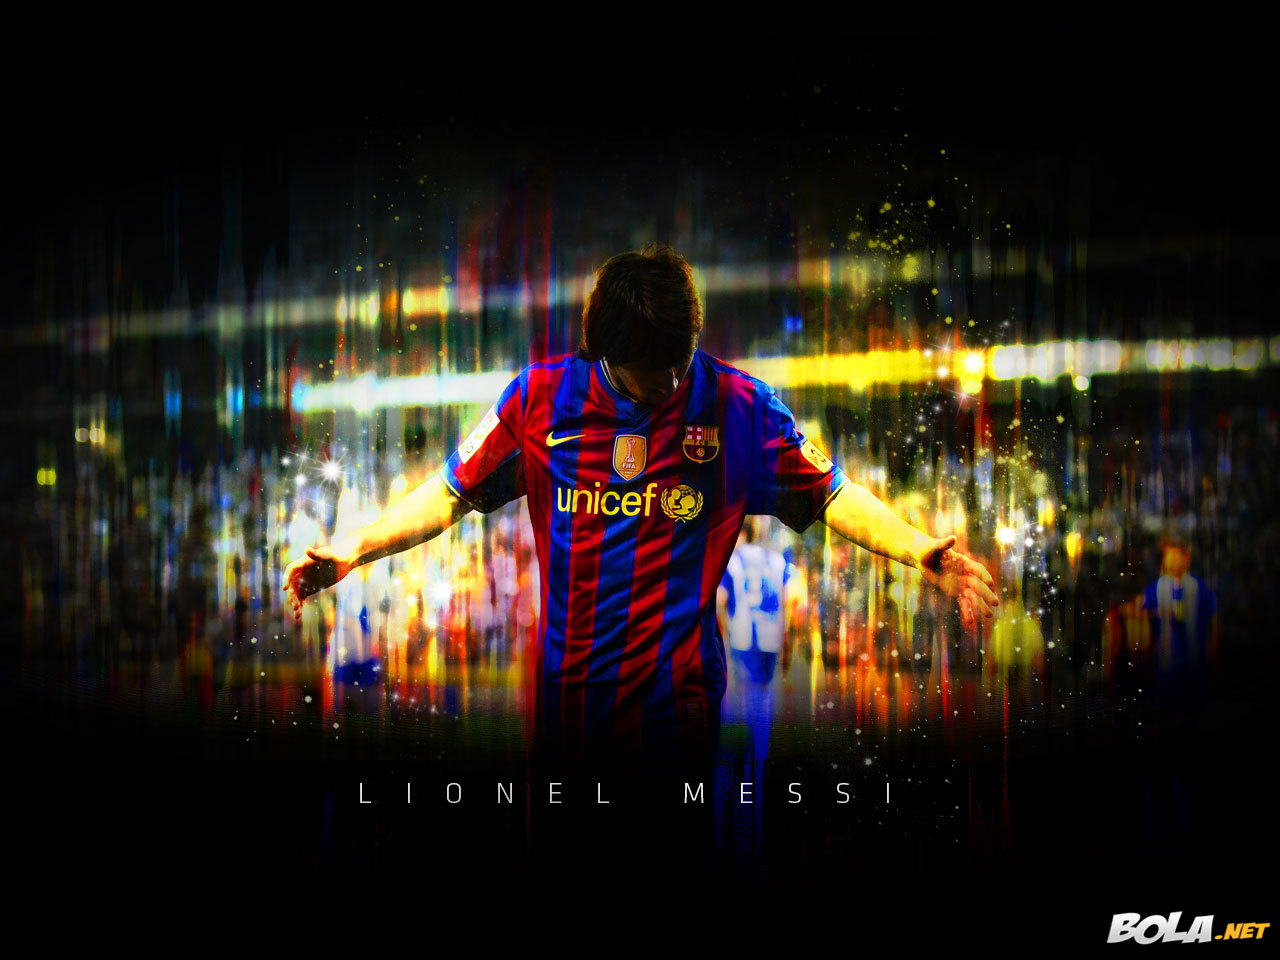 http://2.bp.blogspot.com/-lF8vsGROdVE/TixU6hVRu8I/AAAAAAAABtM/9naPZLjhDto/s1600/Lionel-Messi-Wallpaper-2011-20.jpg